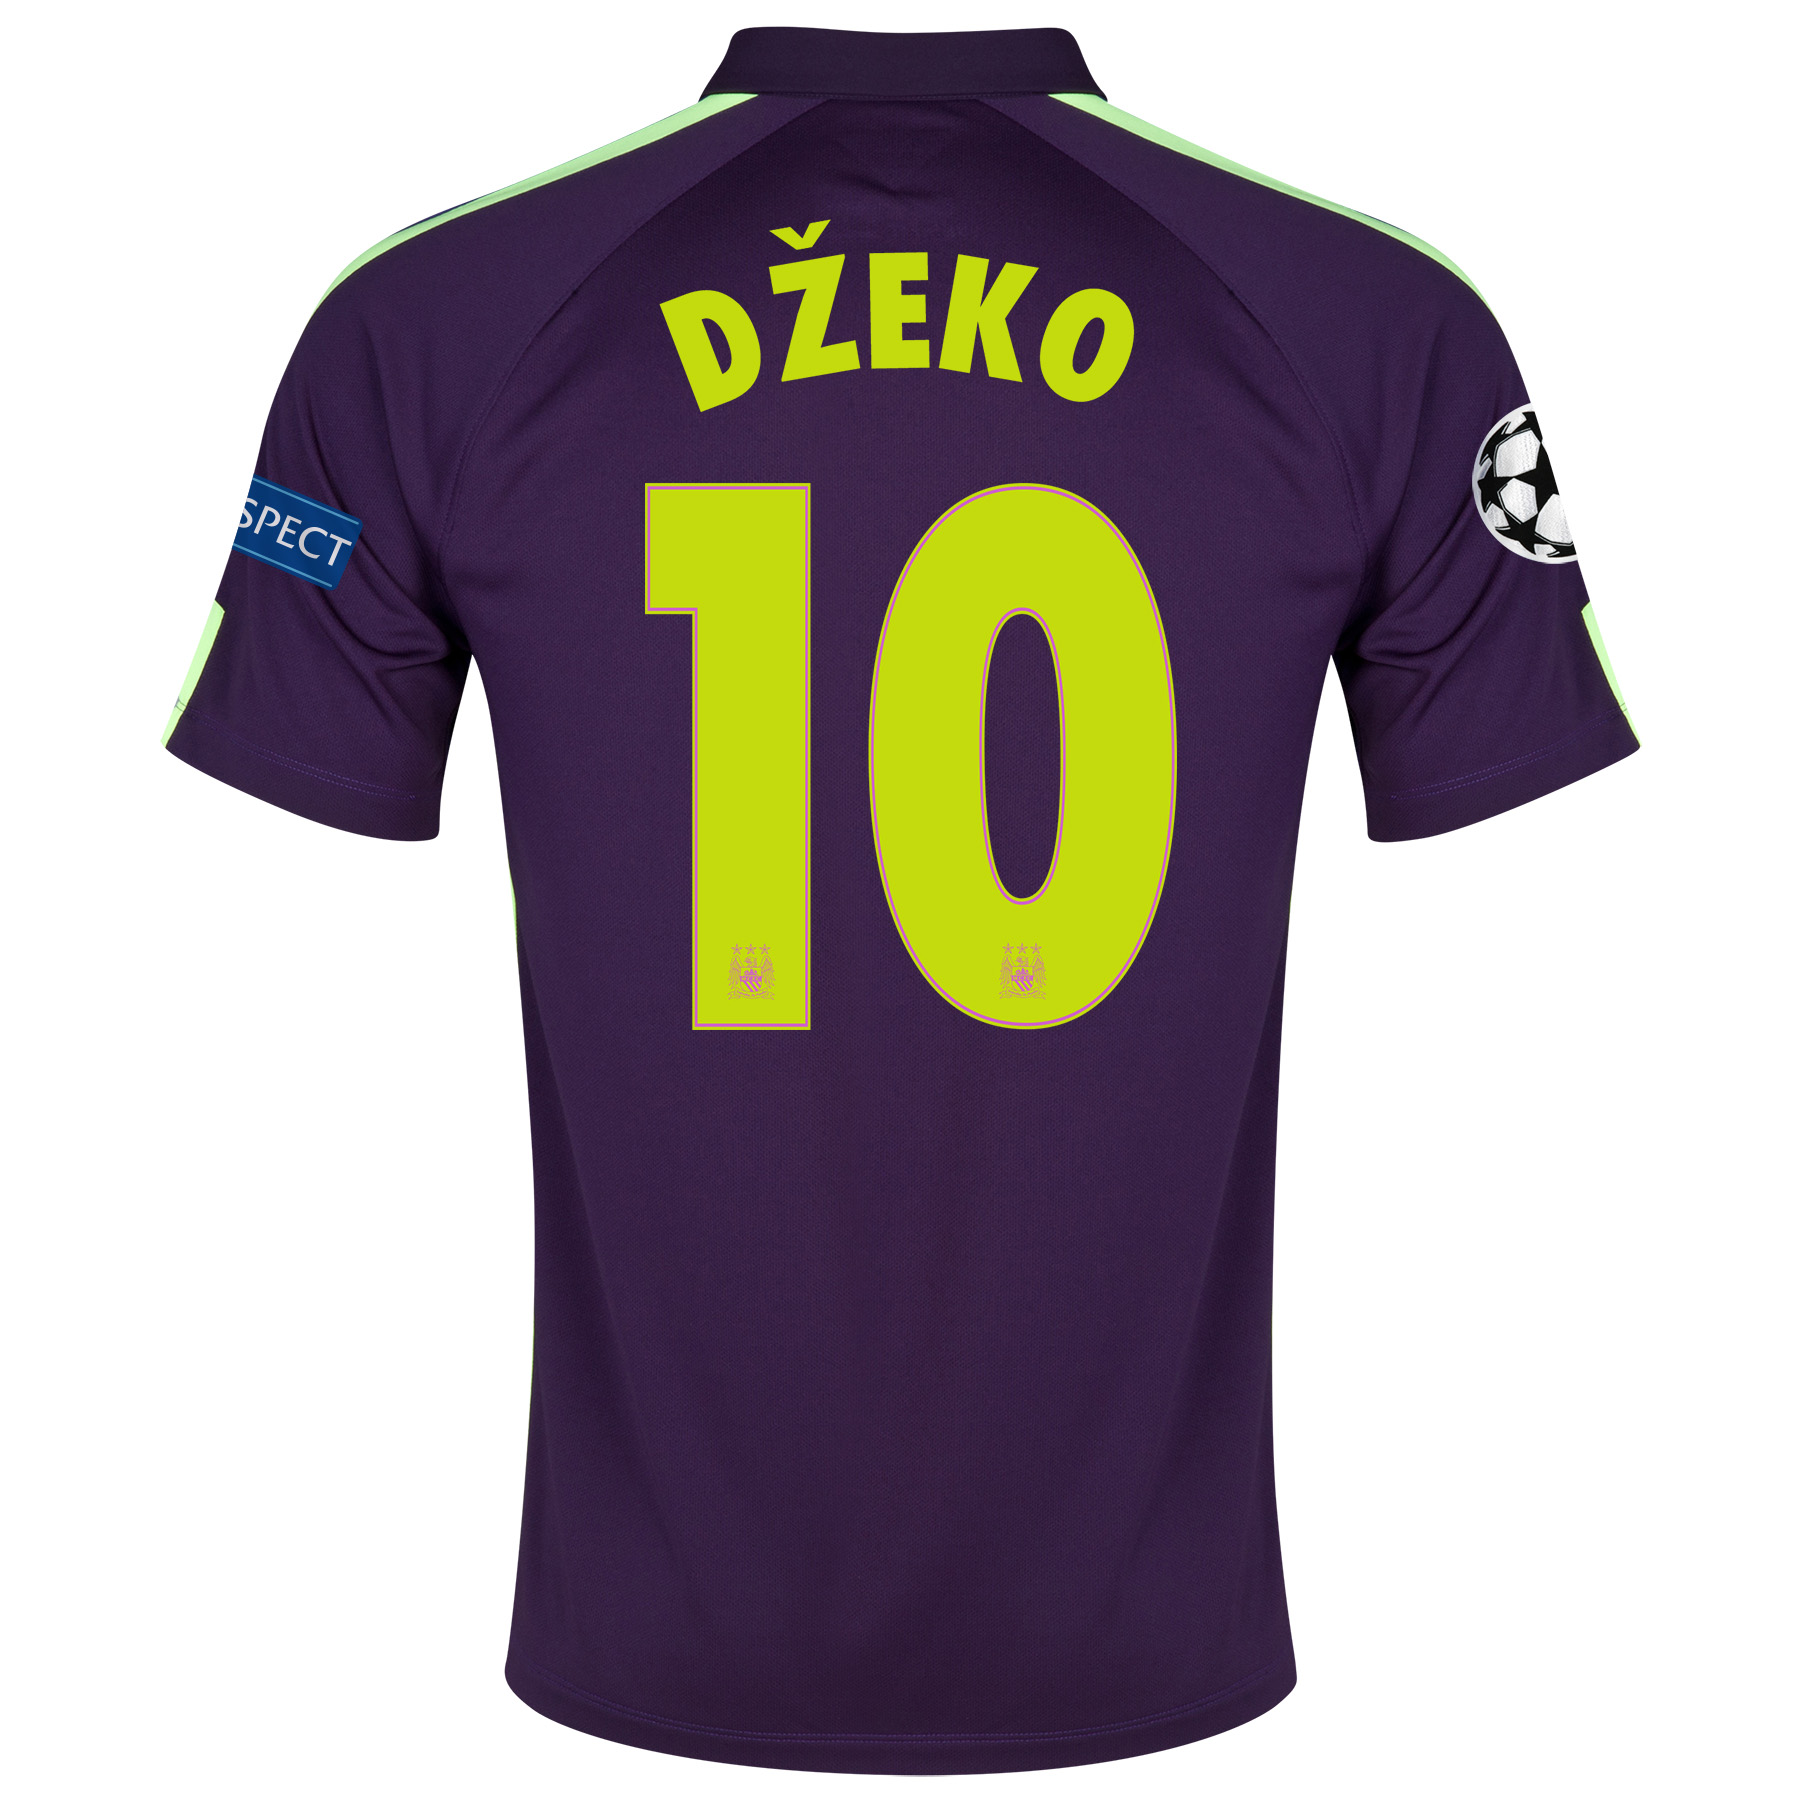 Manchester City UEFA Champions League Cup Away Shirt 2014/15 - Kids Purple with Dzeko 10 printing